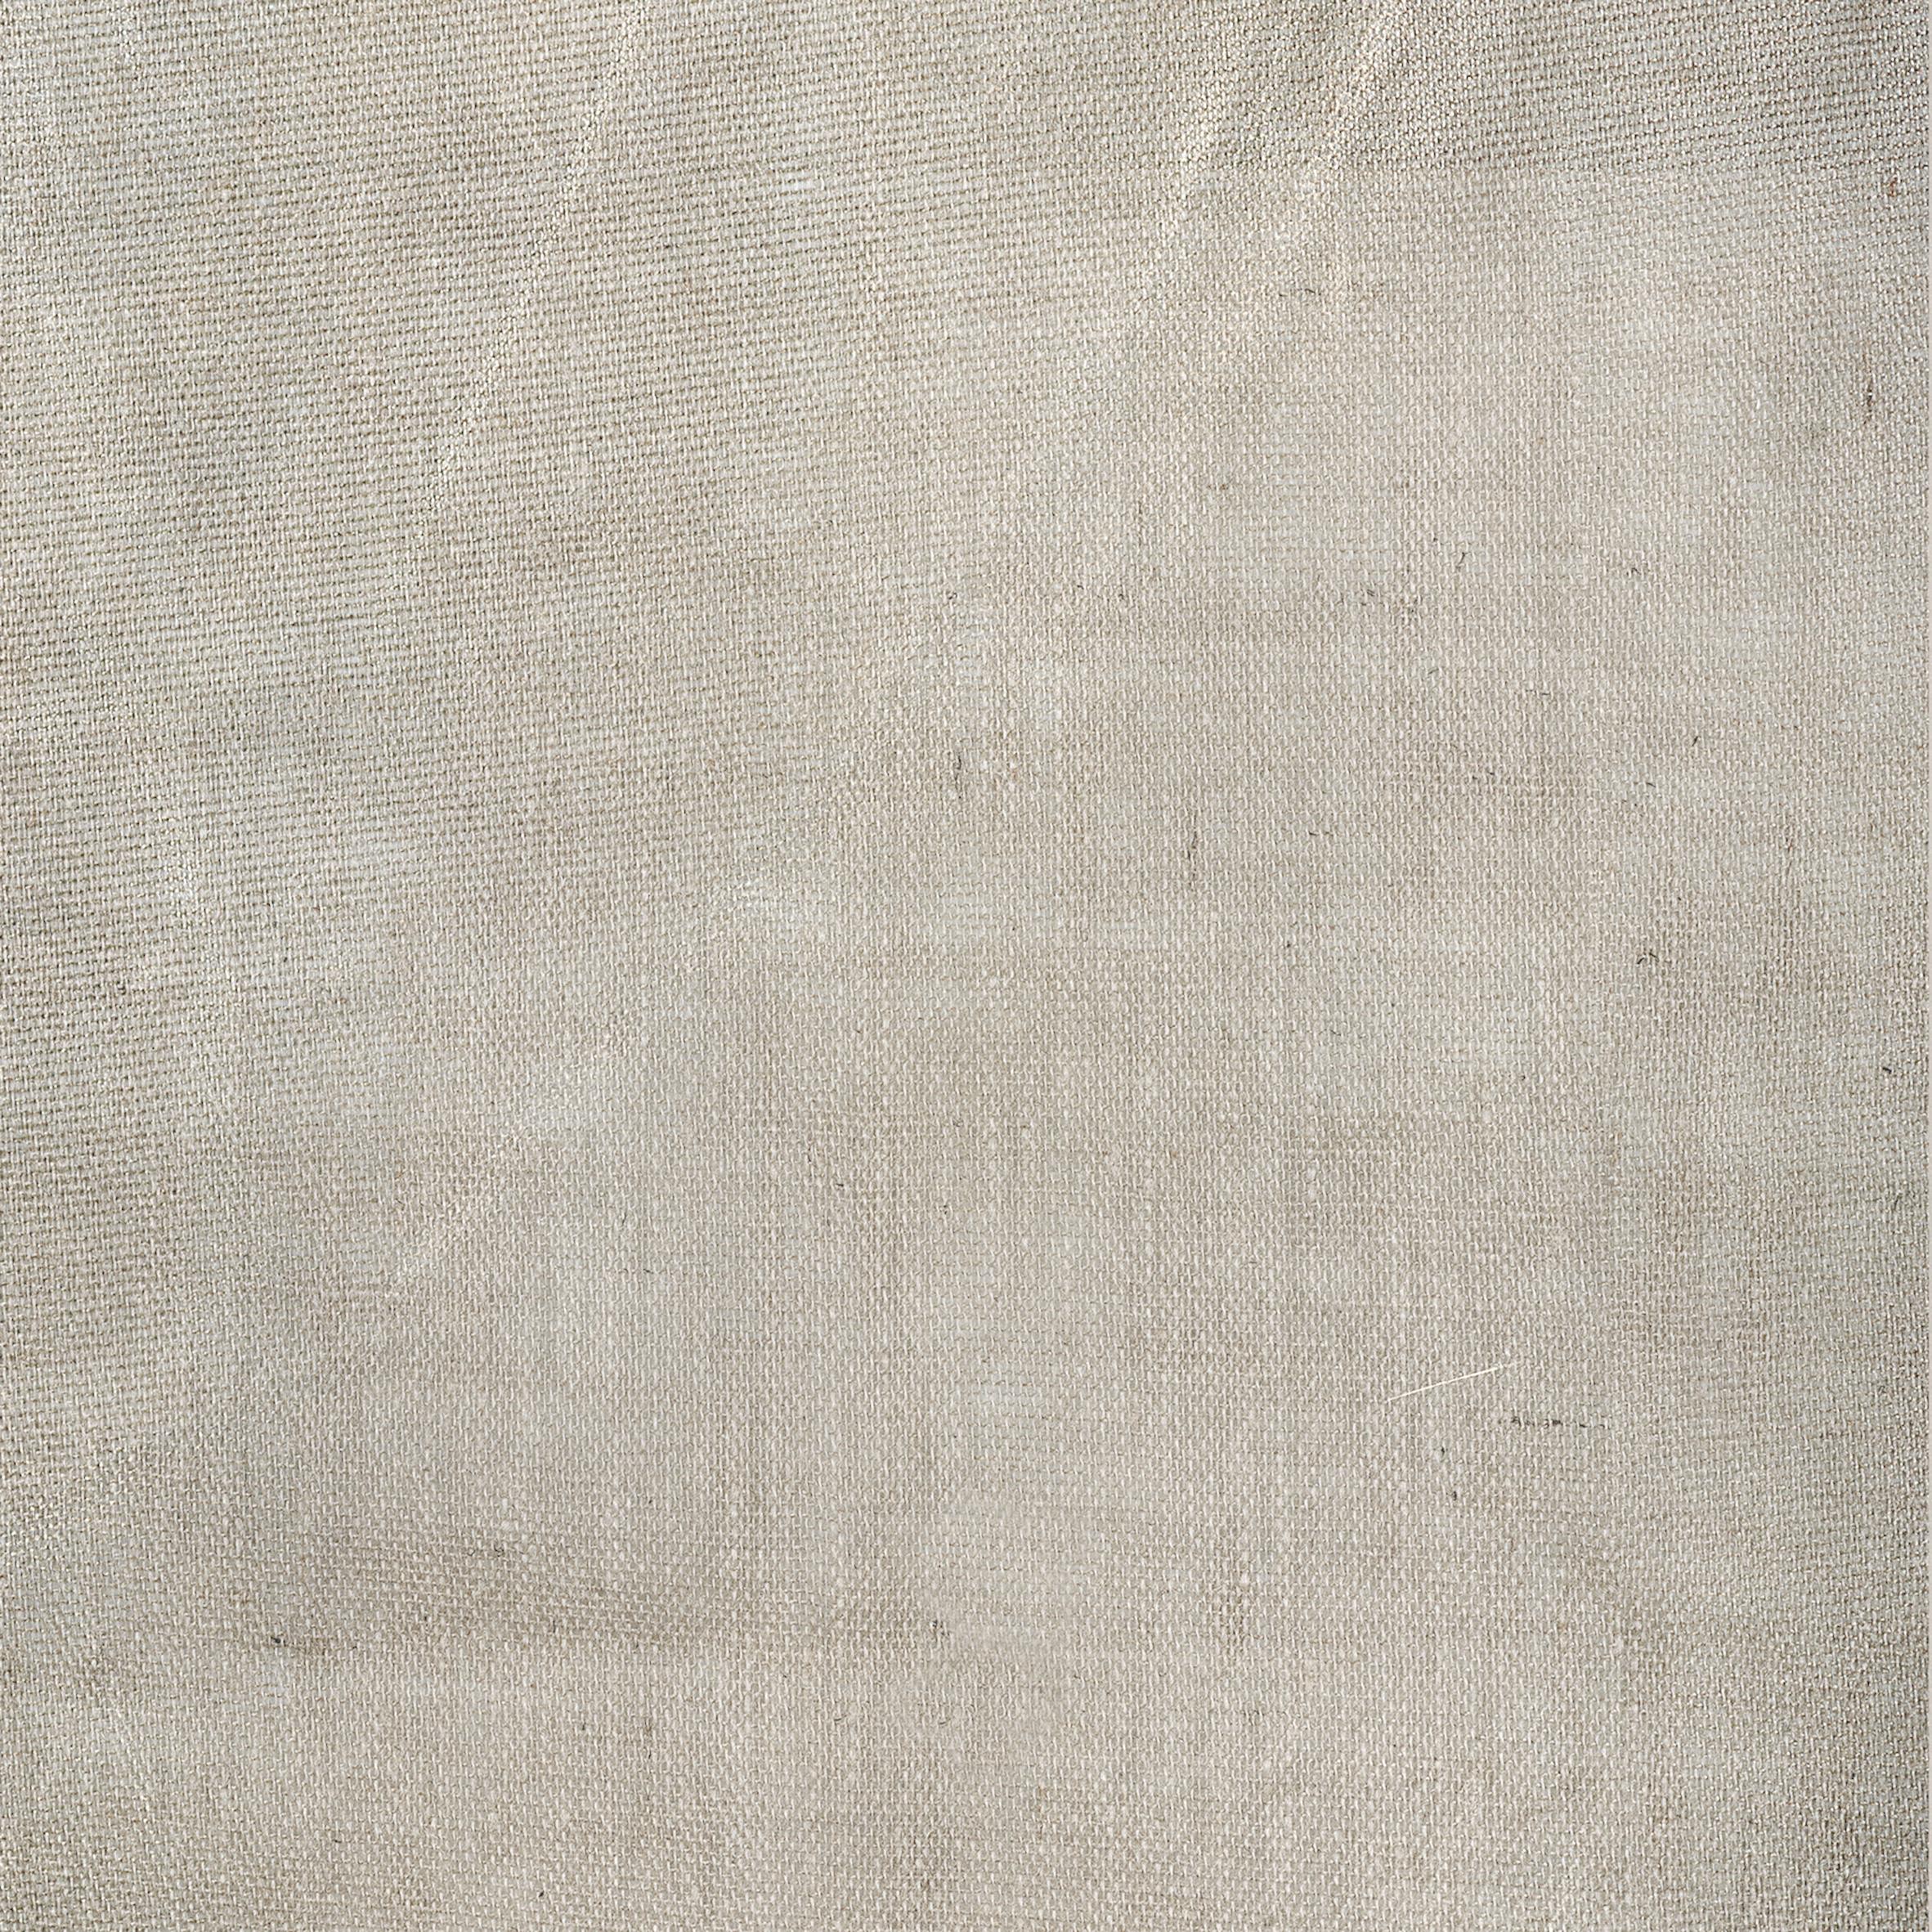 Silver Hex Porcelain Floor Tile